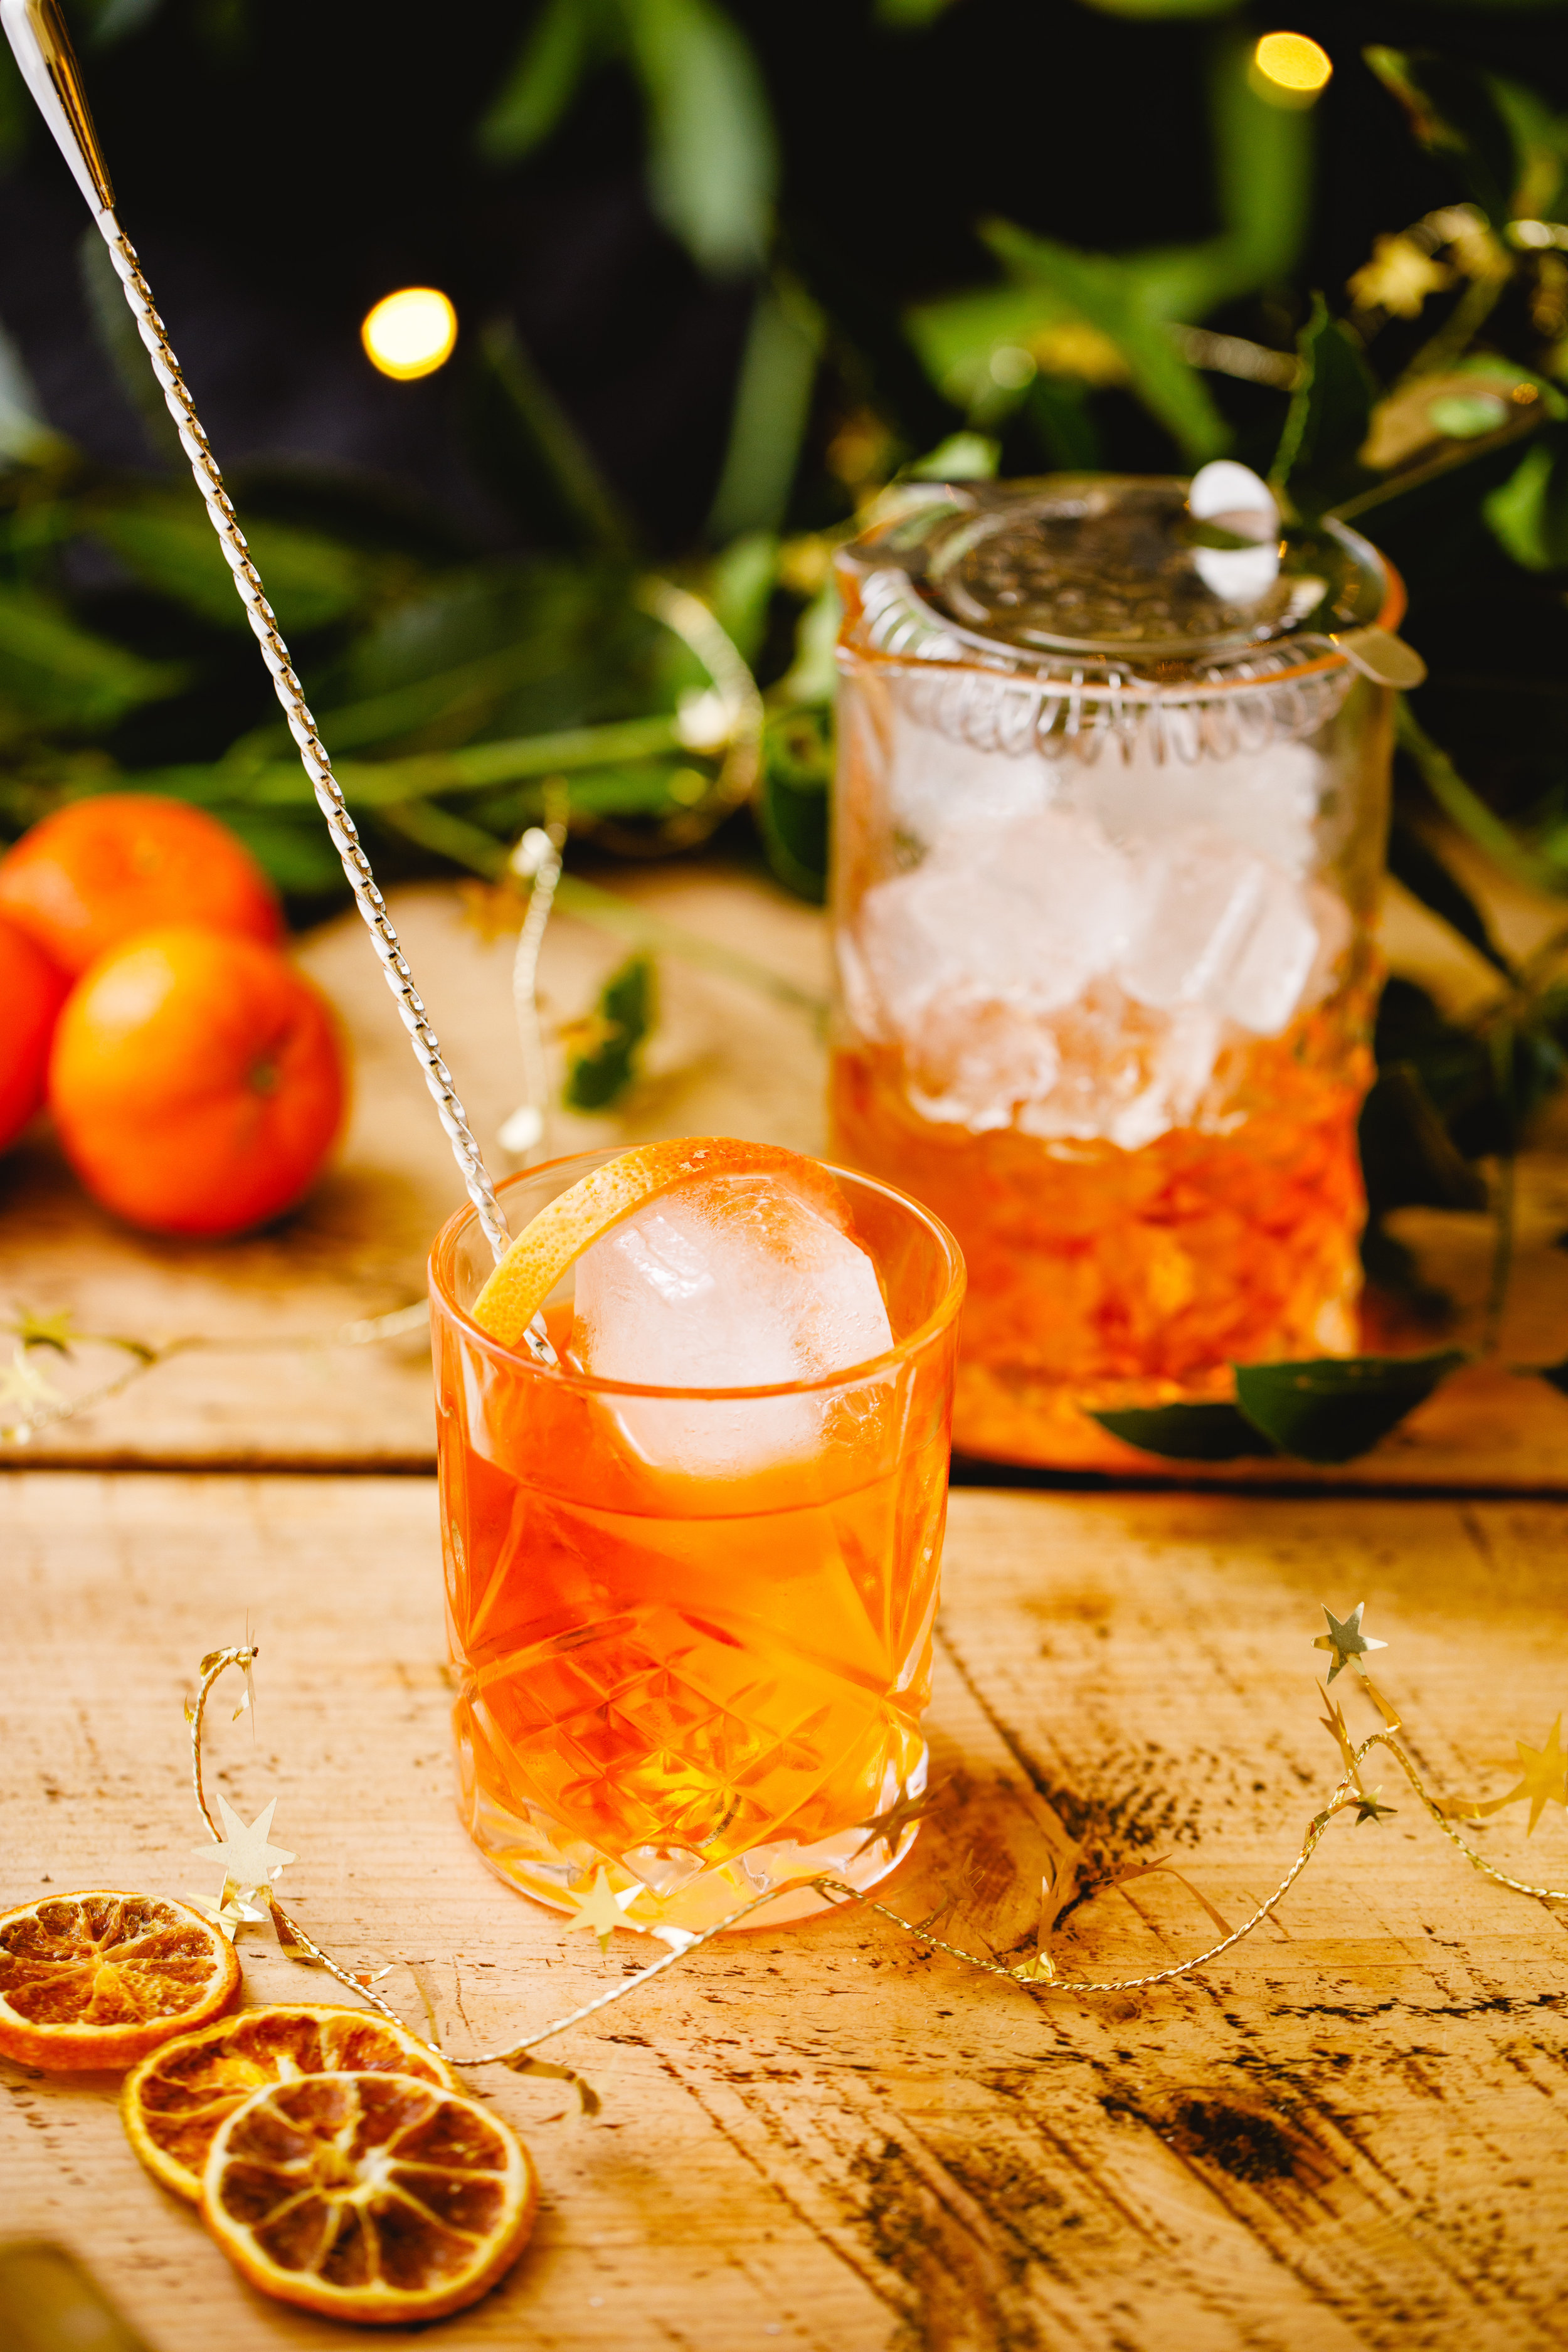 Orange Spice Negroni - Difficulty: Easy. Can be prepared in advance! Winner, Winner, Turkey Dinner.